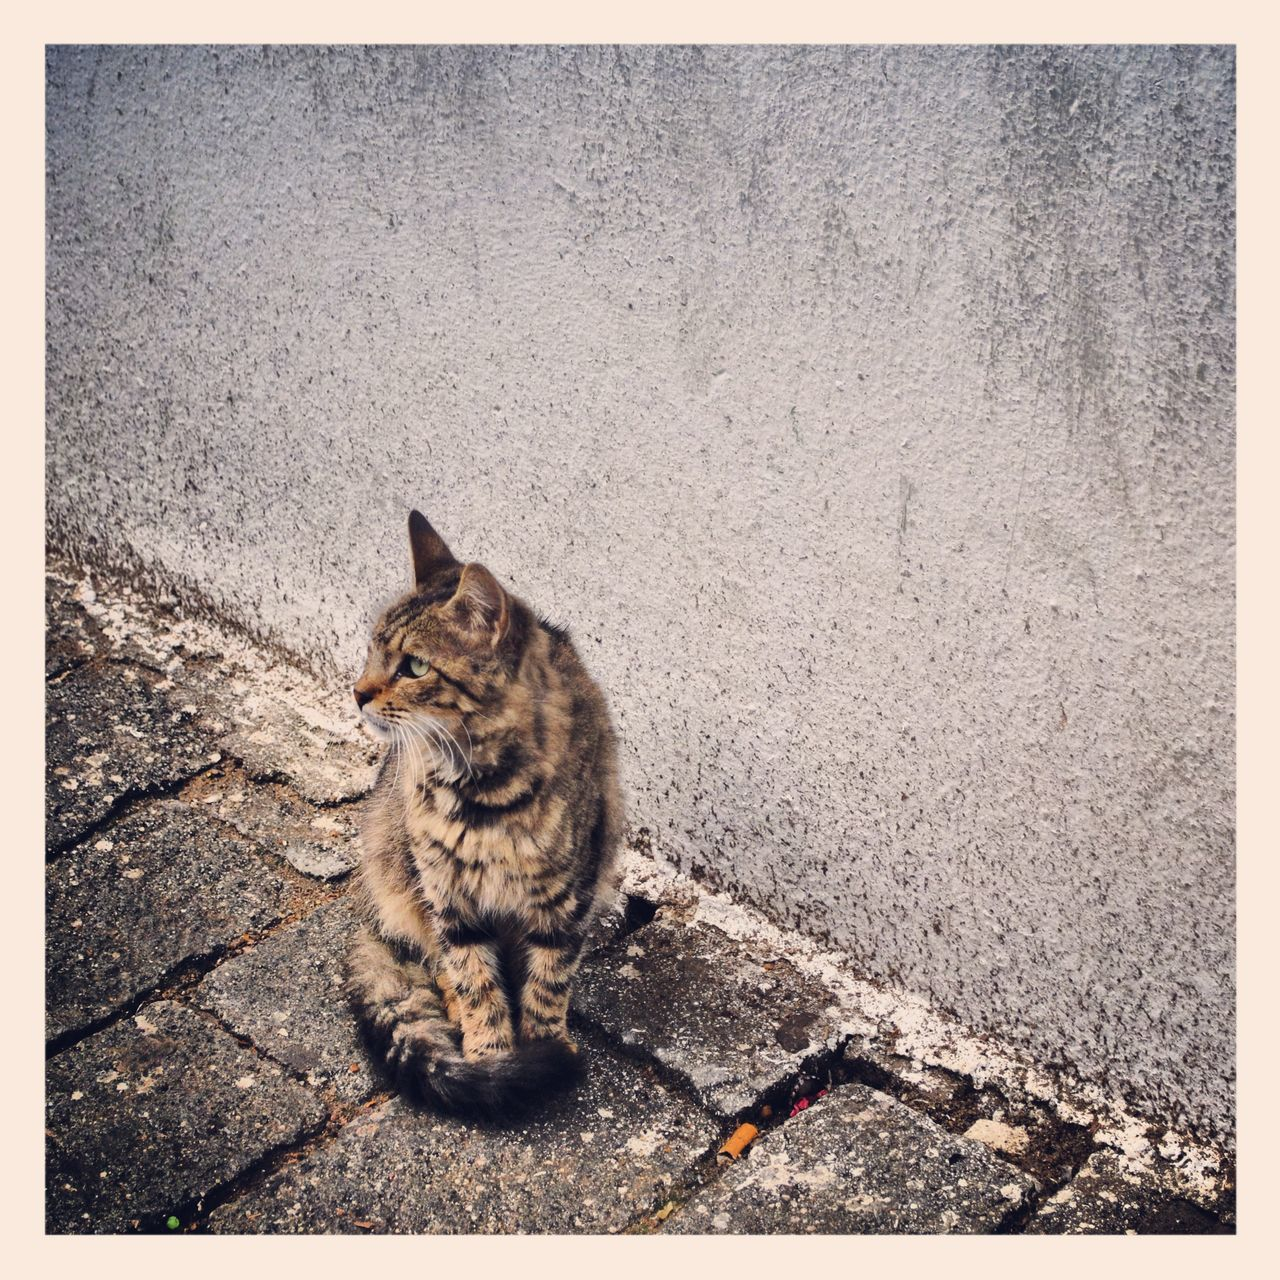 EyeEmNewHere Djerba, Tunisia Tunesia Tunesien Cat Cats Of EyeEm Streetphotography